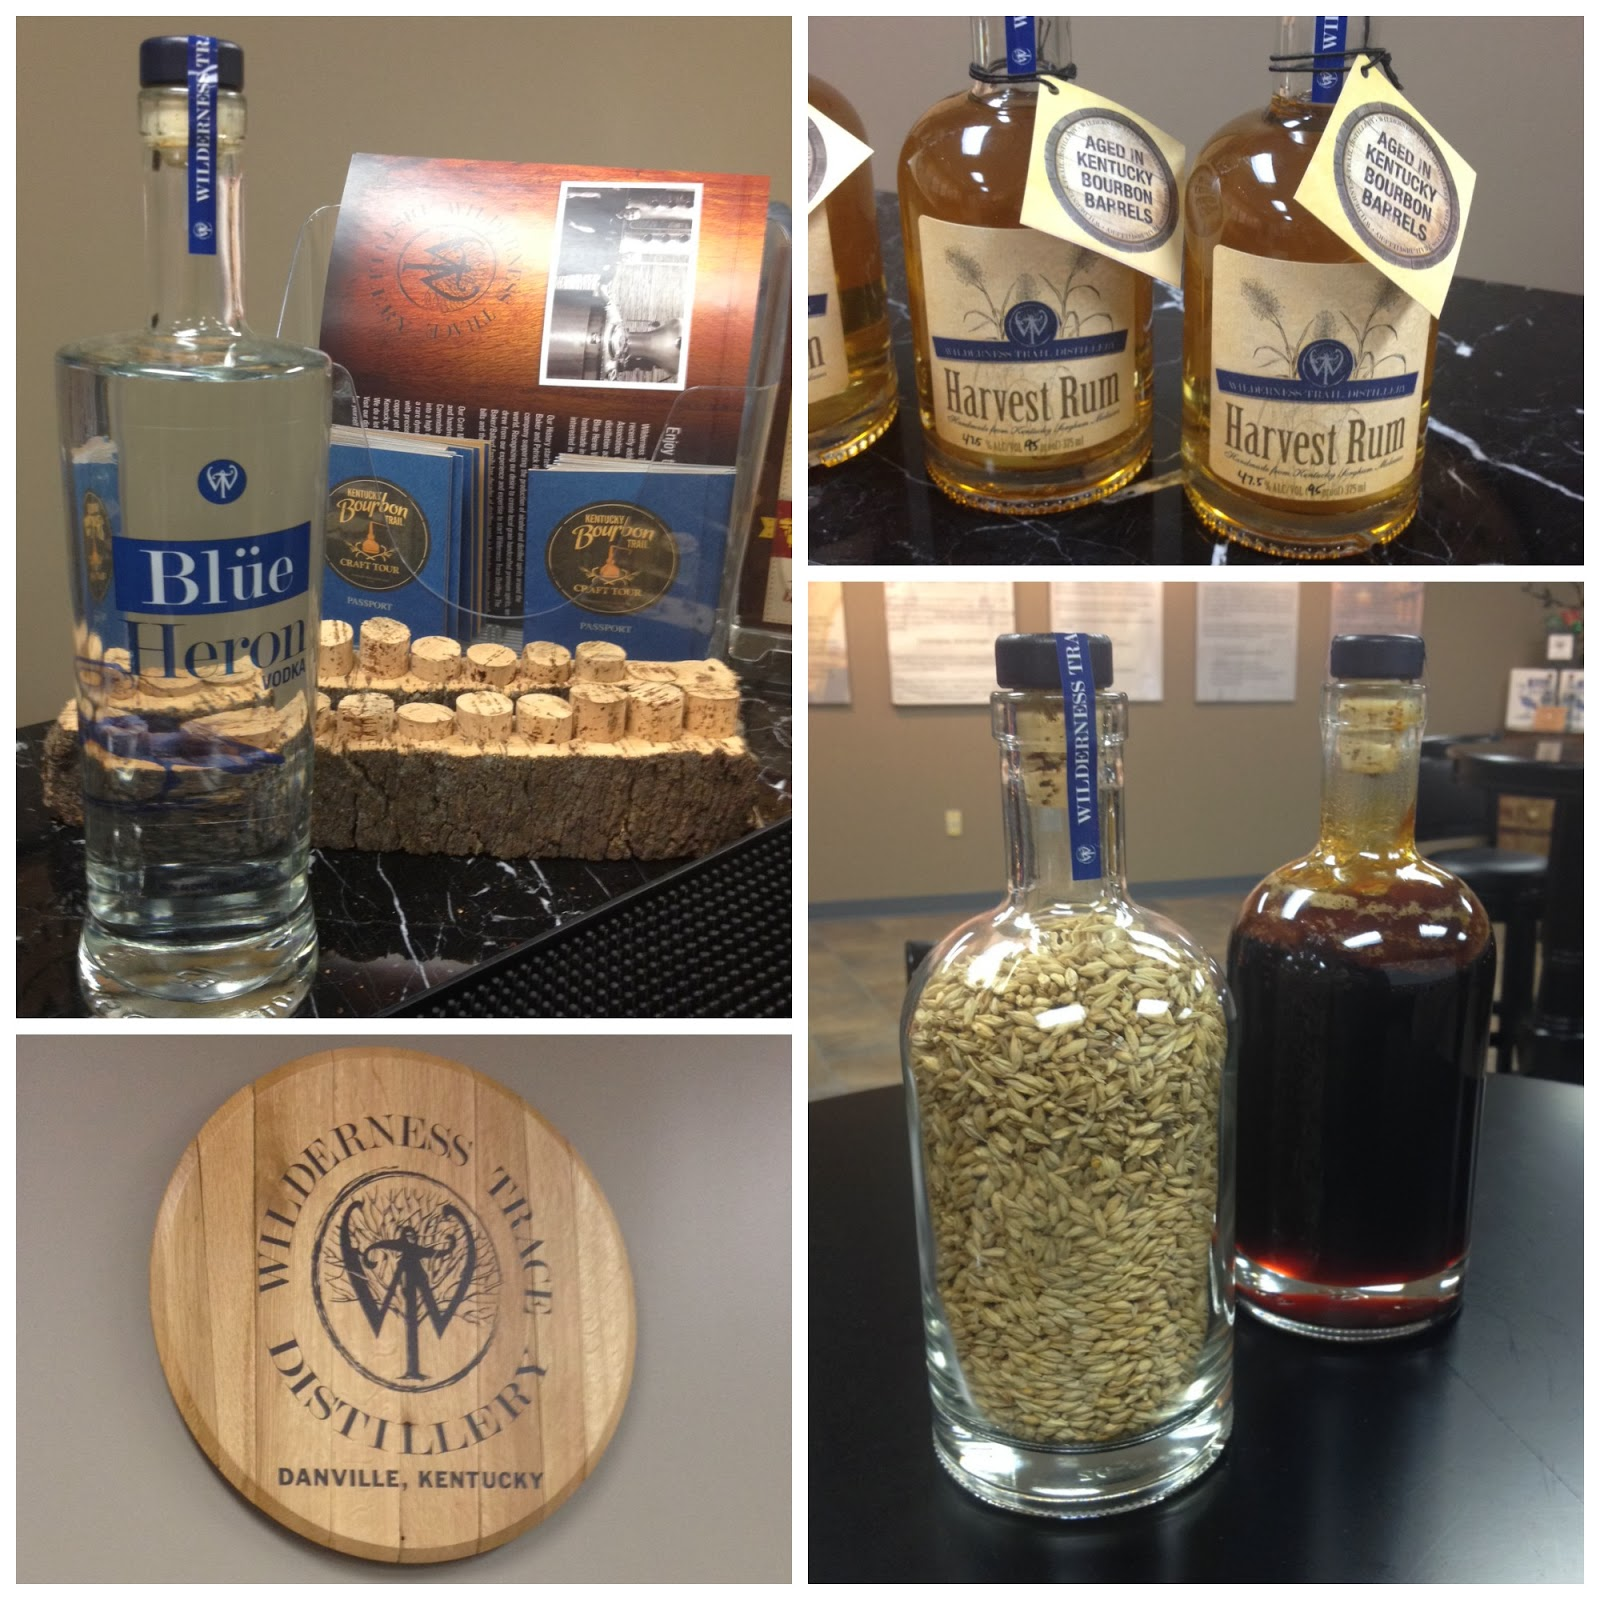 Road trip danville ky craft bourbon craft beer the for Kentucky craft bourbon trail